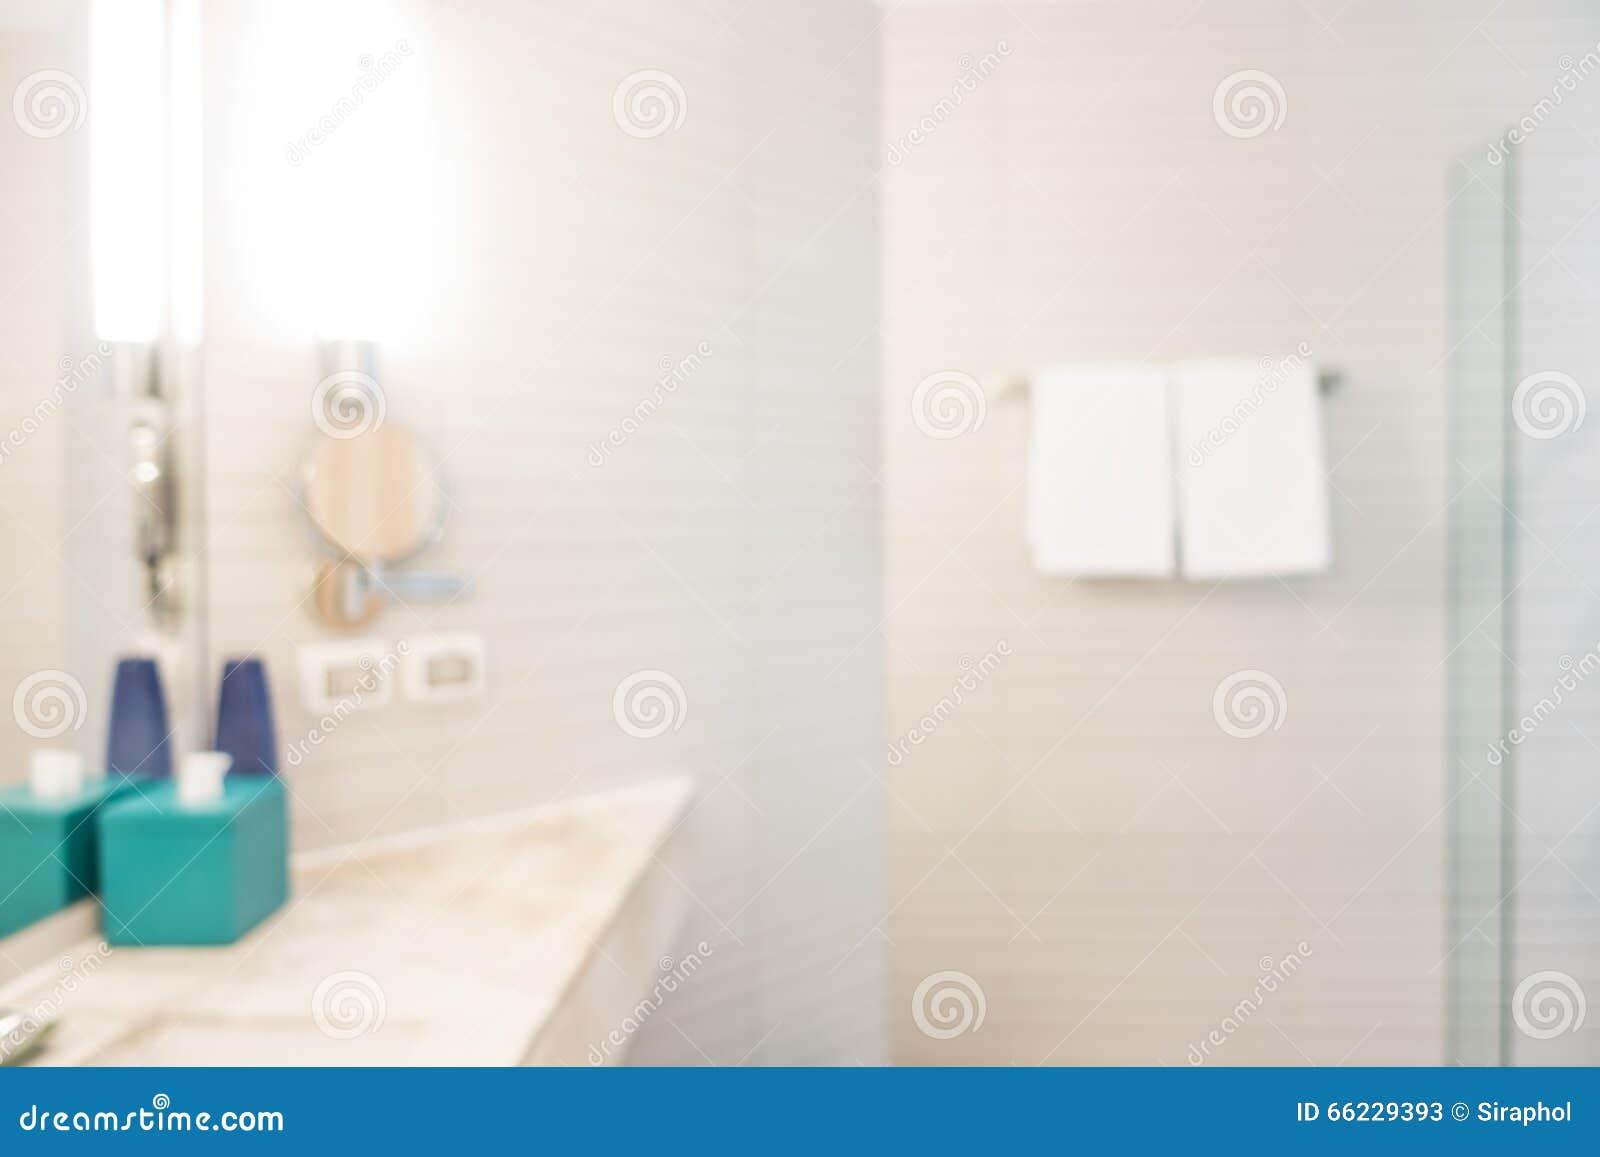 Luxury bathroom plans for Abstract salon barrie